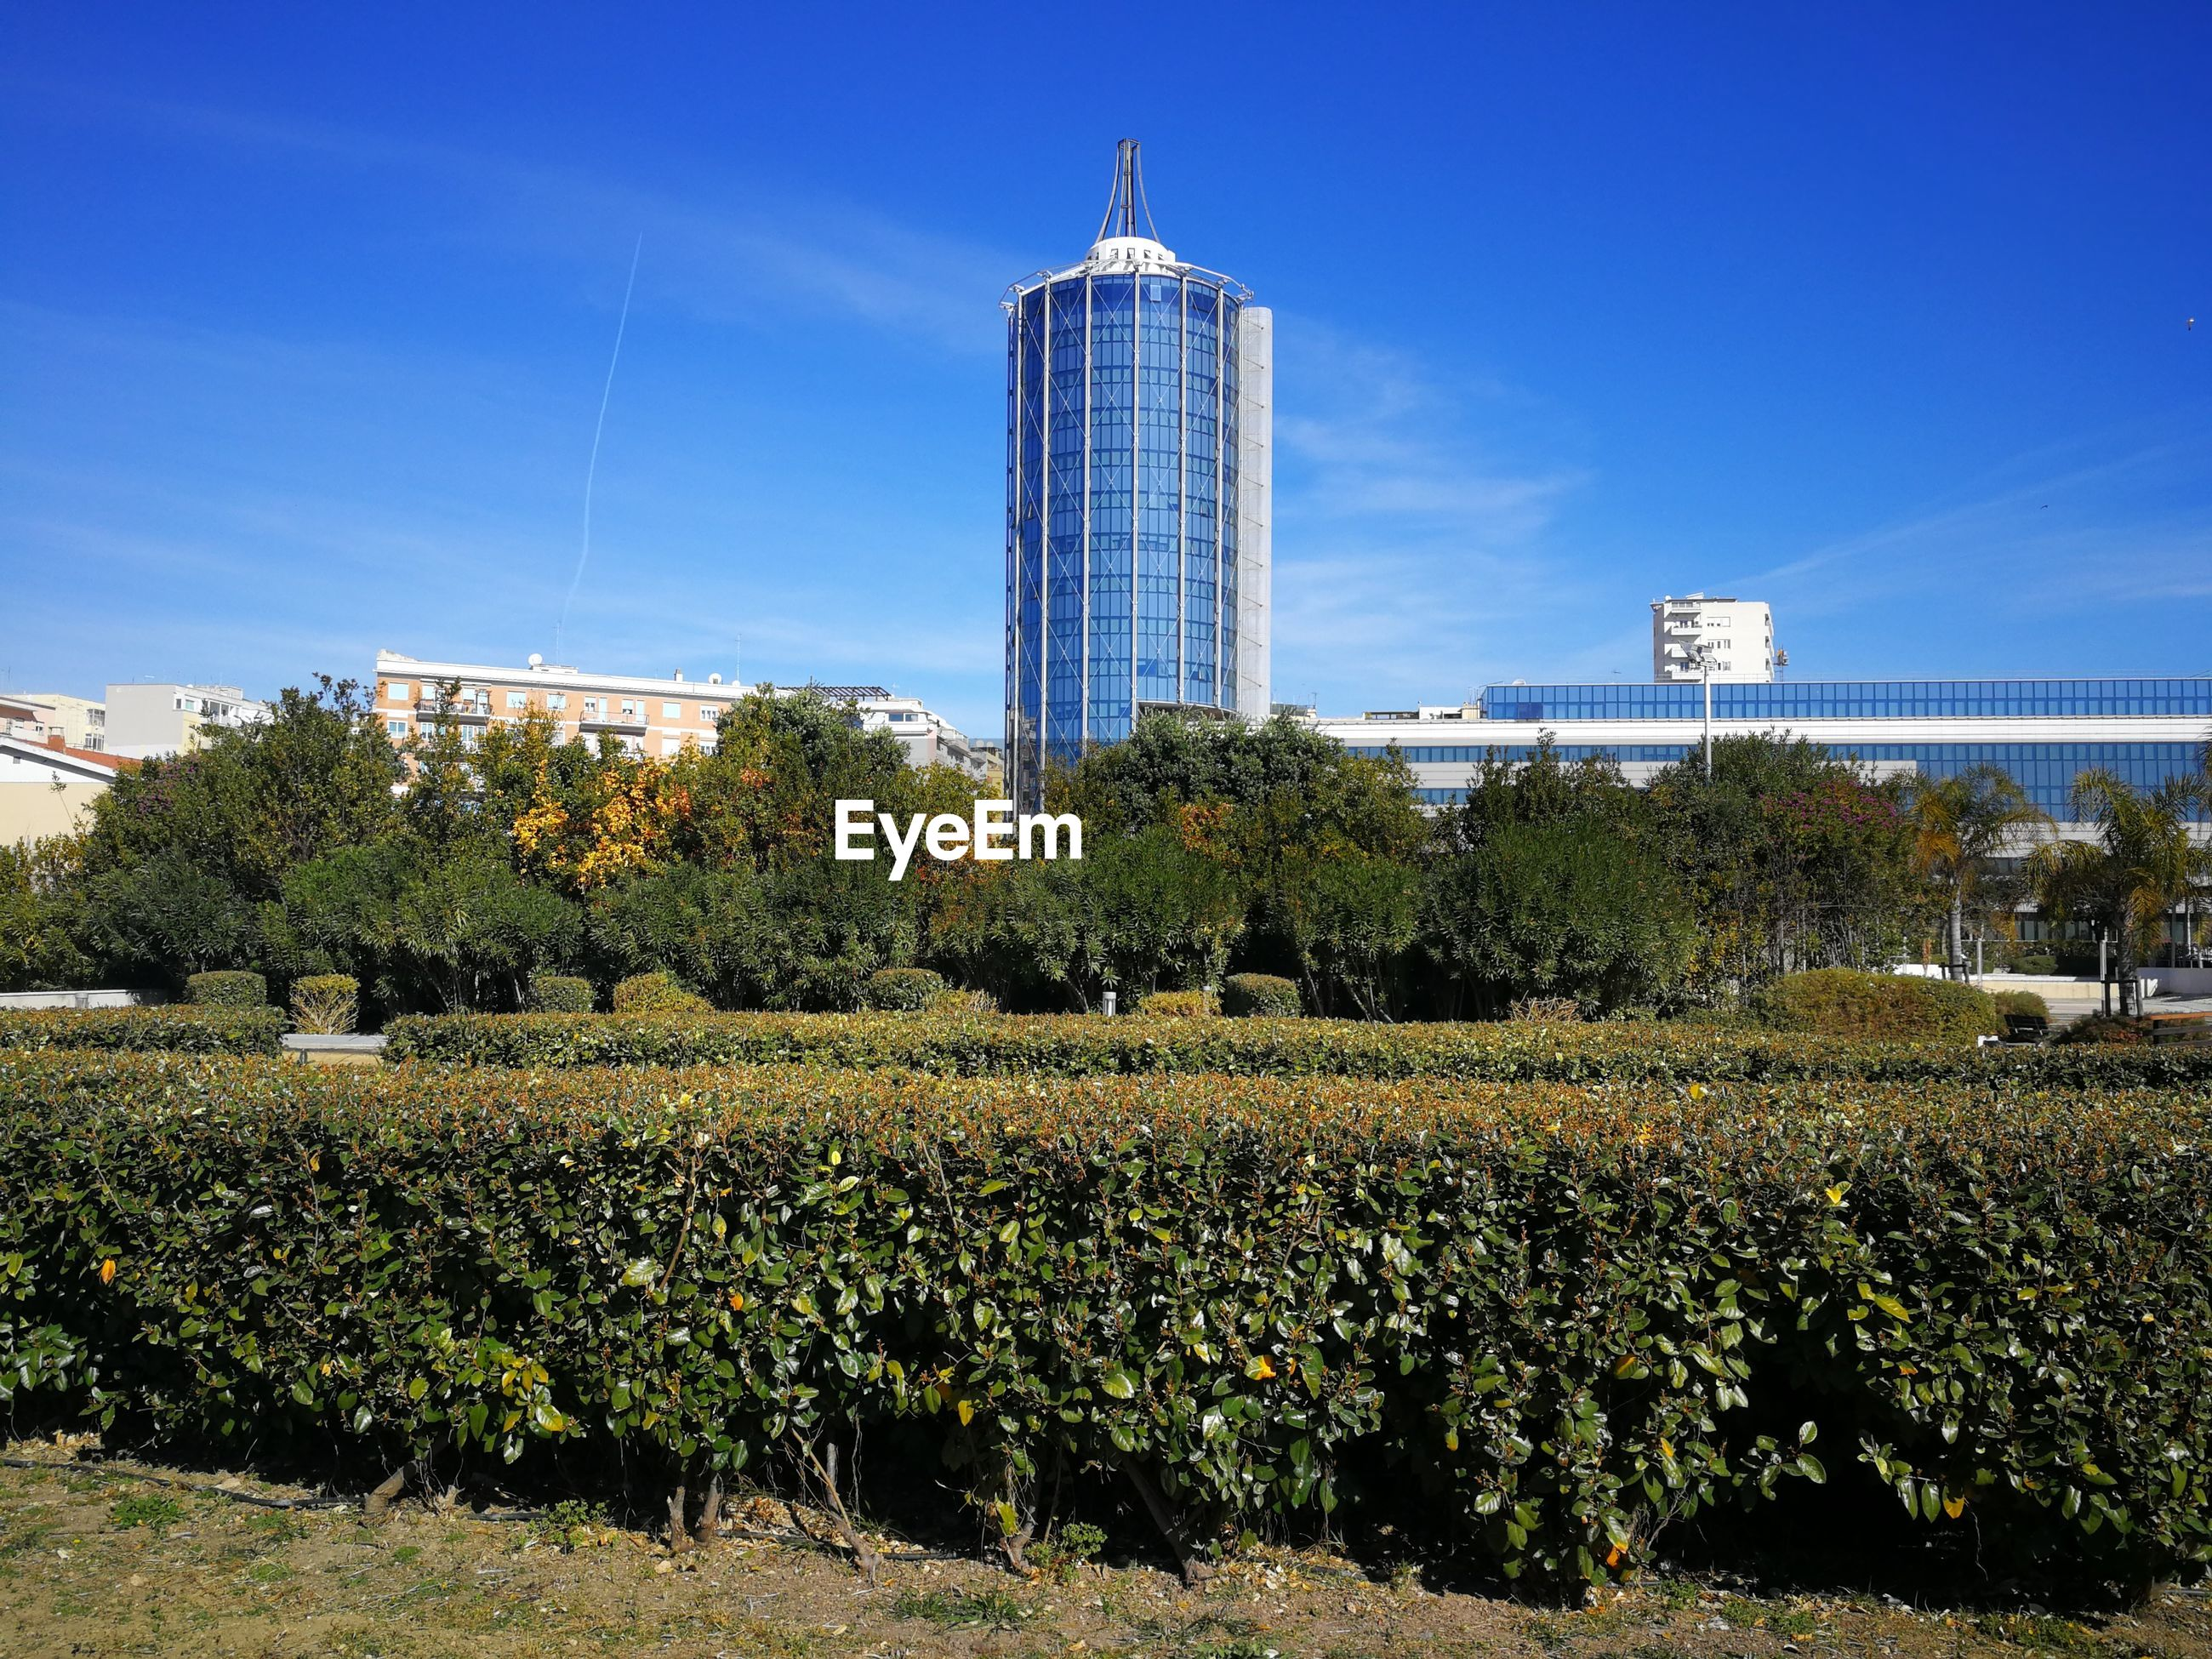 Plants growing on field by buildings against blue sky